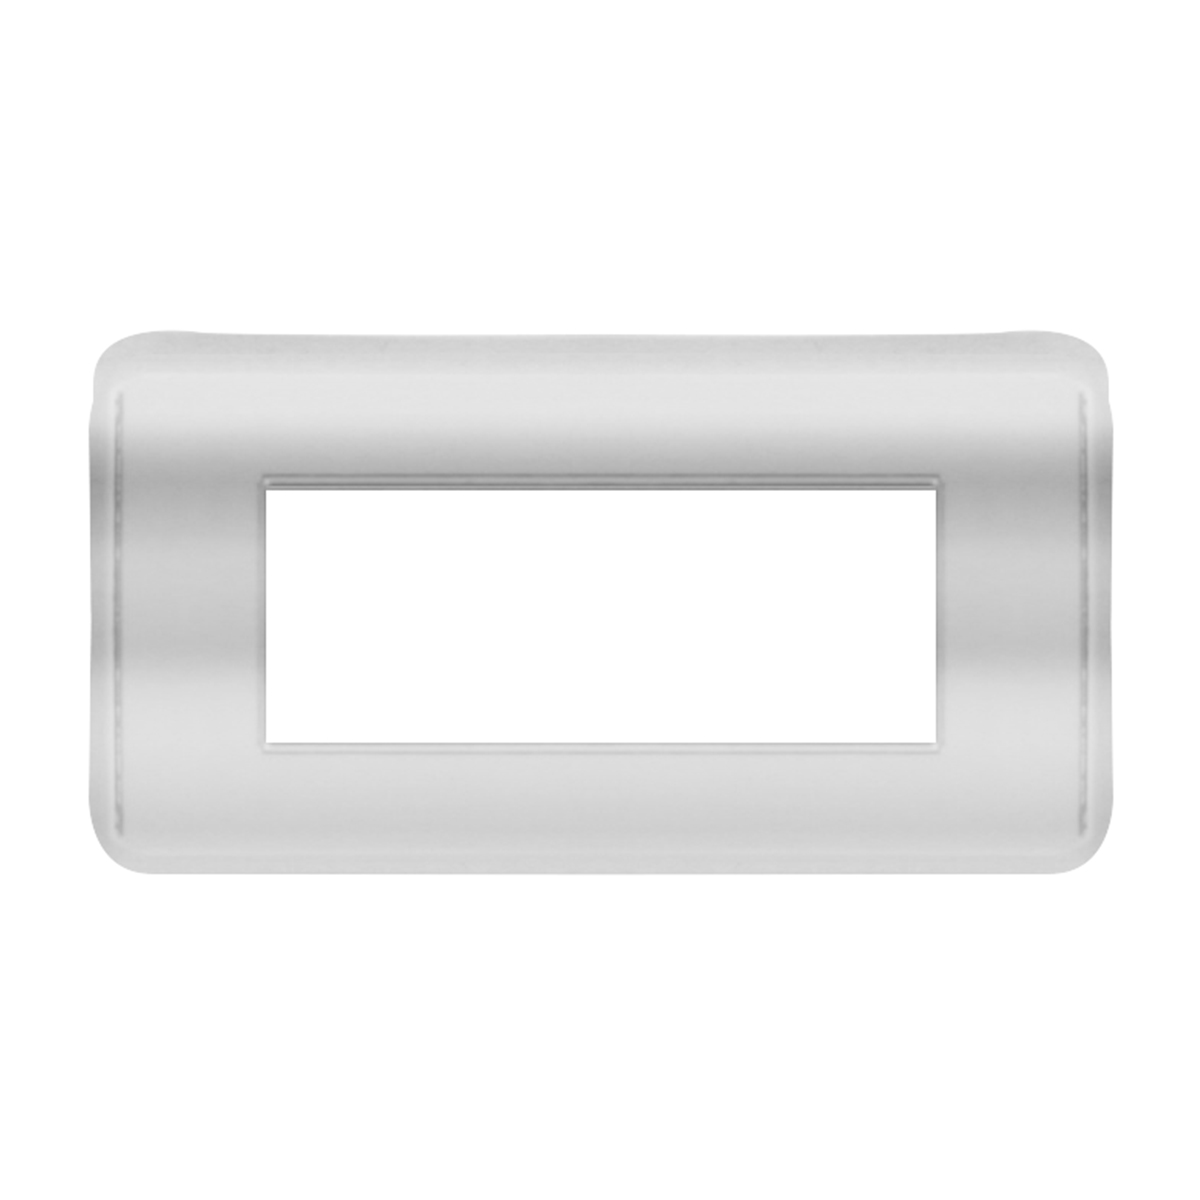 68243 Switch Label Bezel Cover w/ Visor for Kenworth W